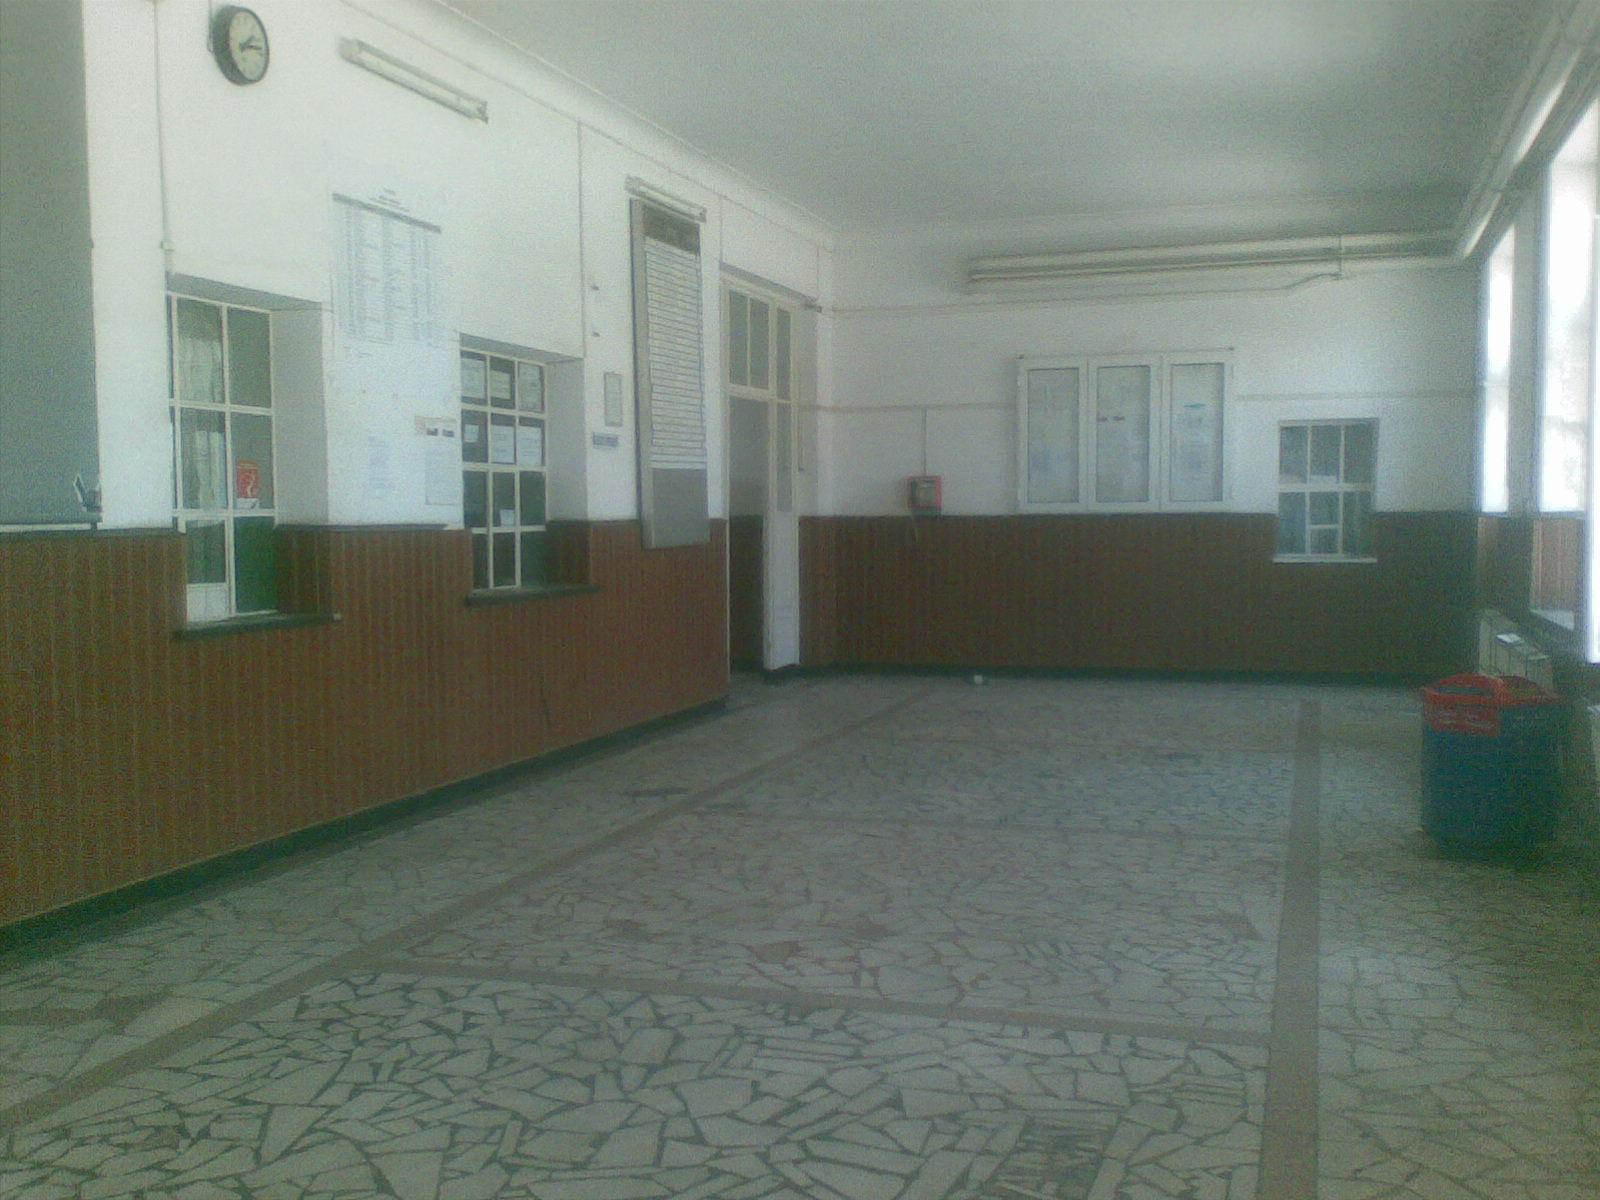 Fişier:Interiorul garii CFR Slatina.jpg